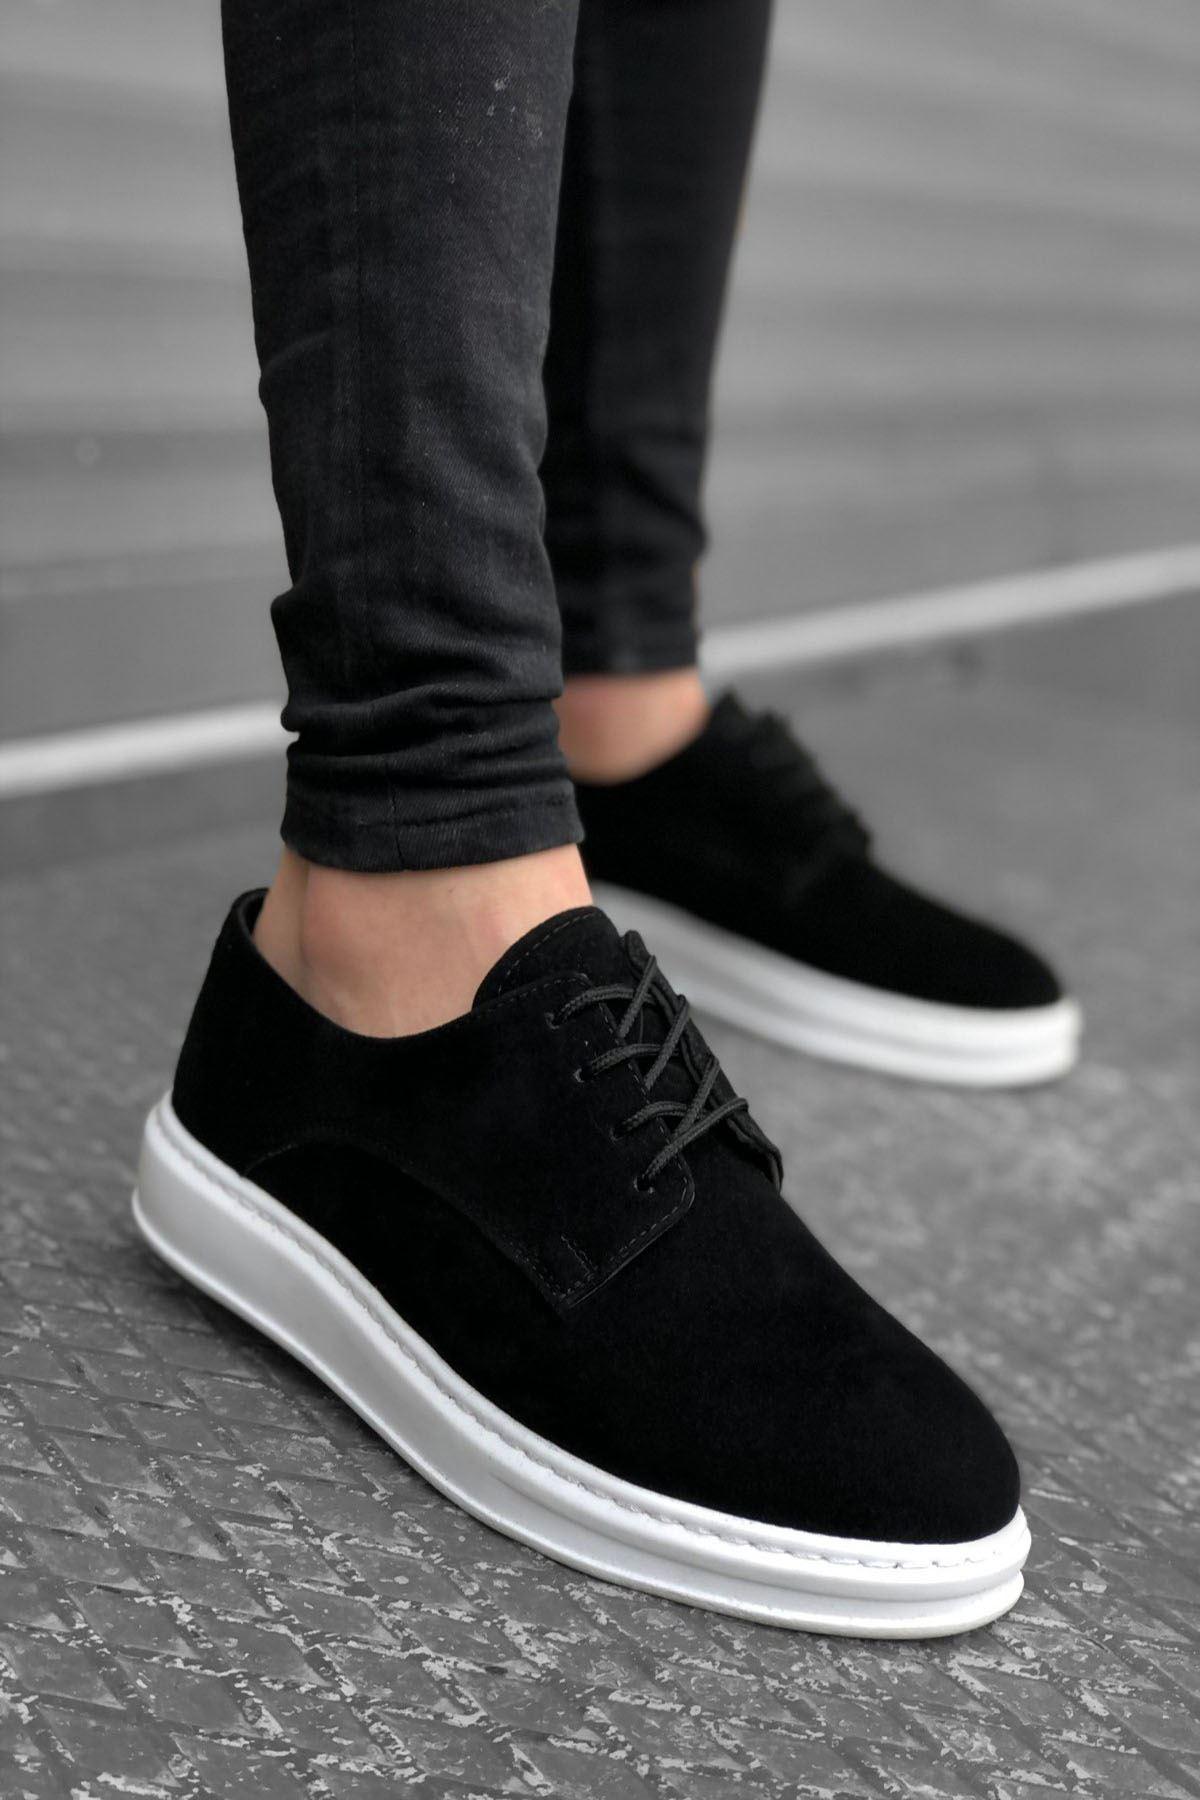 B003 Siyah Keten BT Klasik Ayakkabı